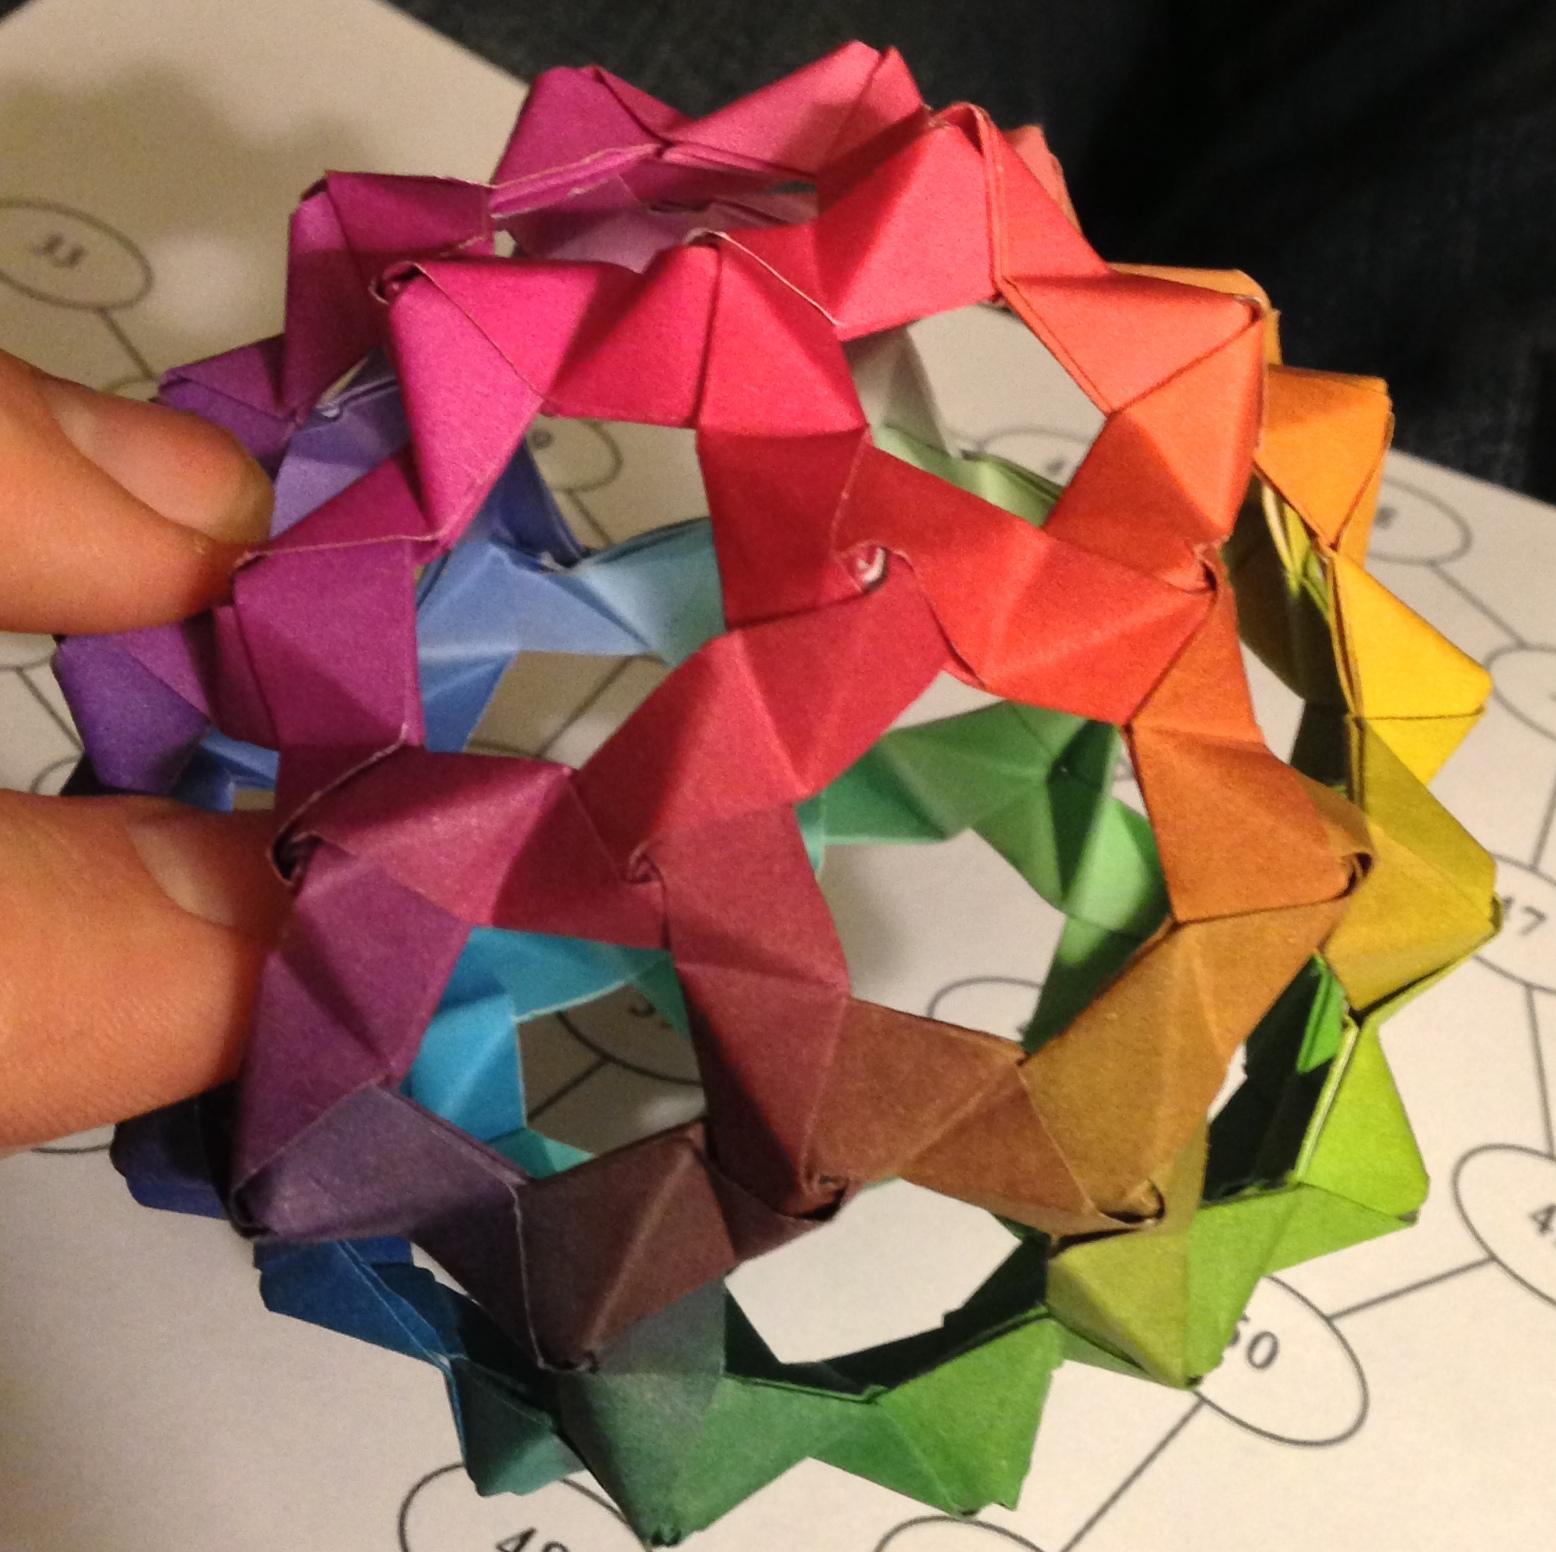 Make the Raibow PHiZZ Origami Buckyball!